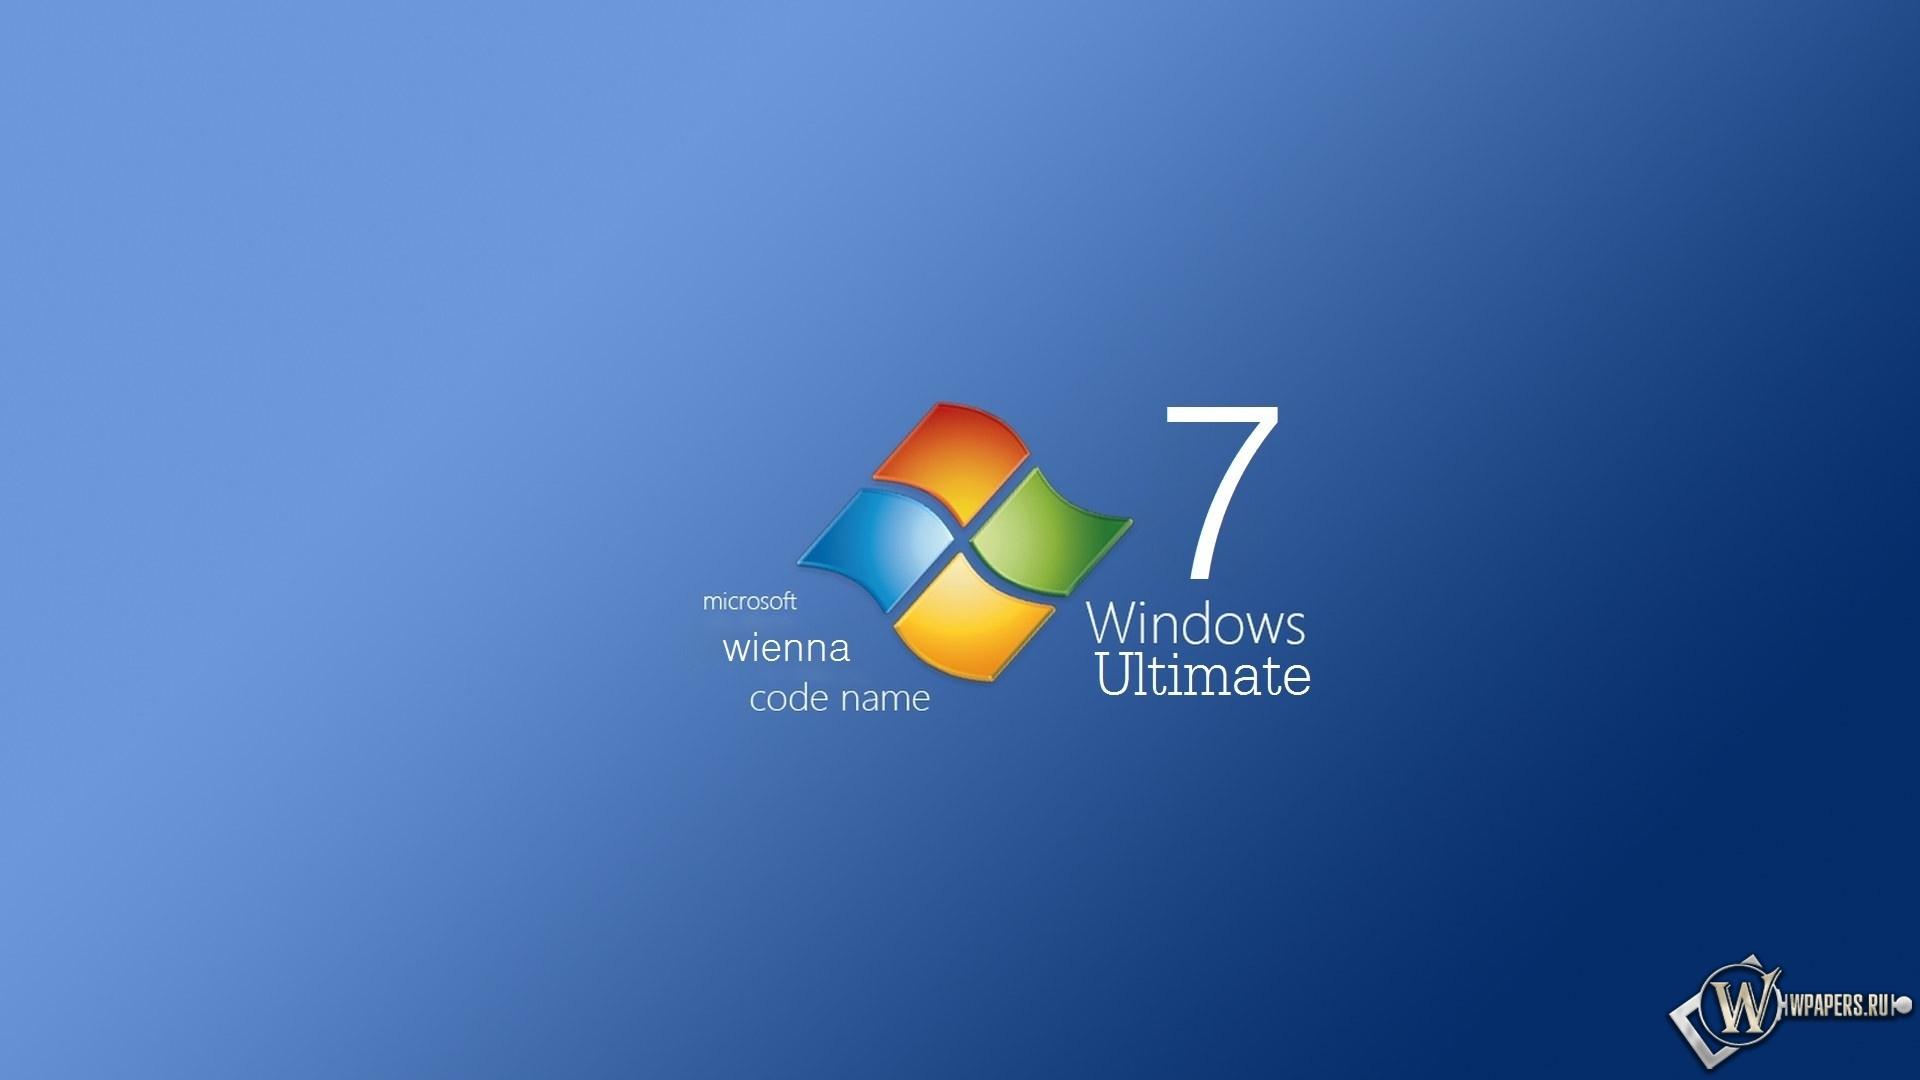 Windows 7 wienna 1920x1080